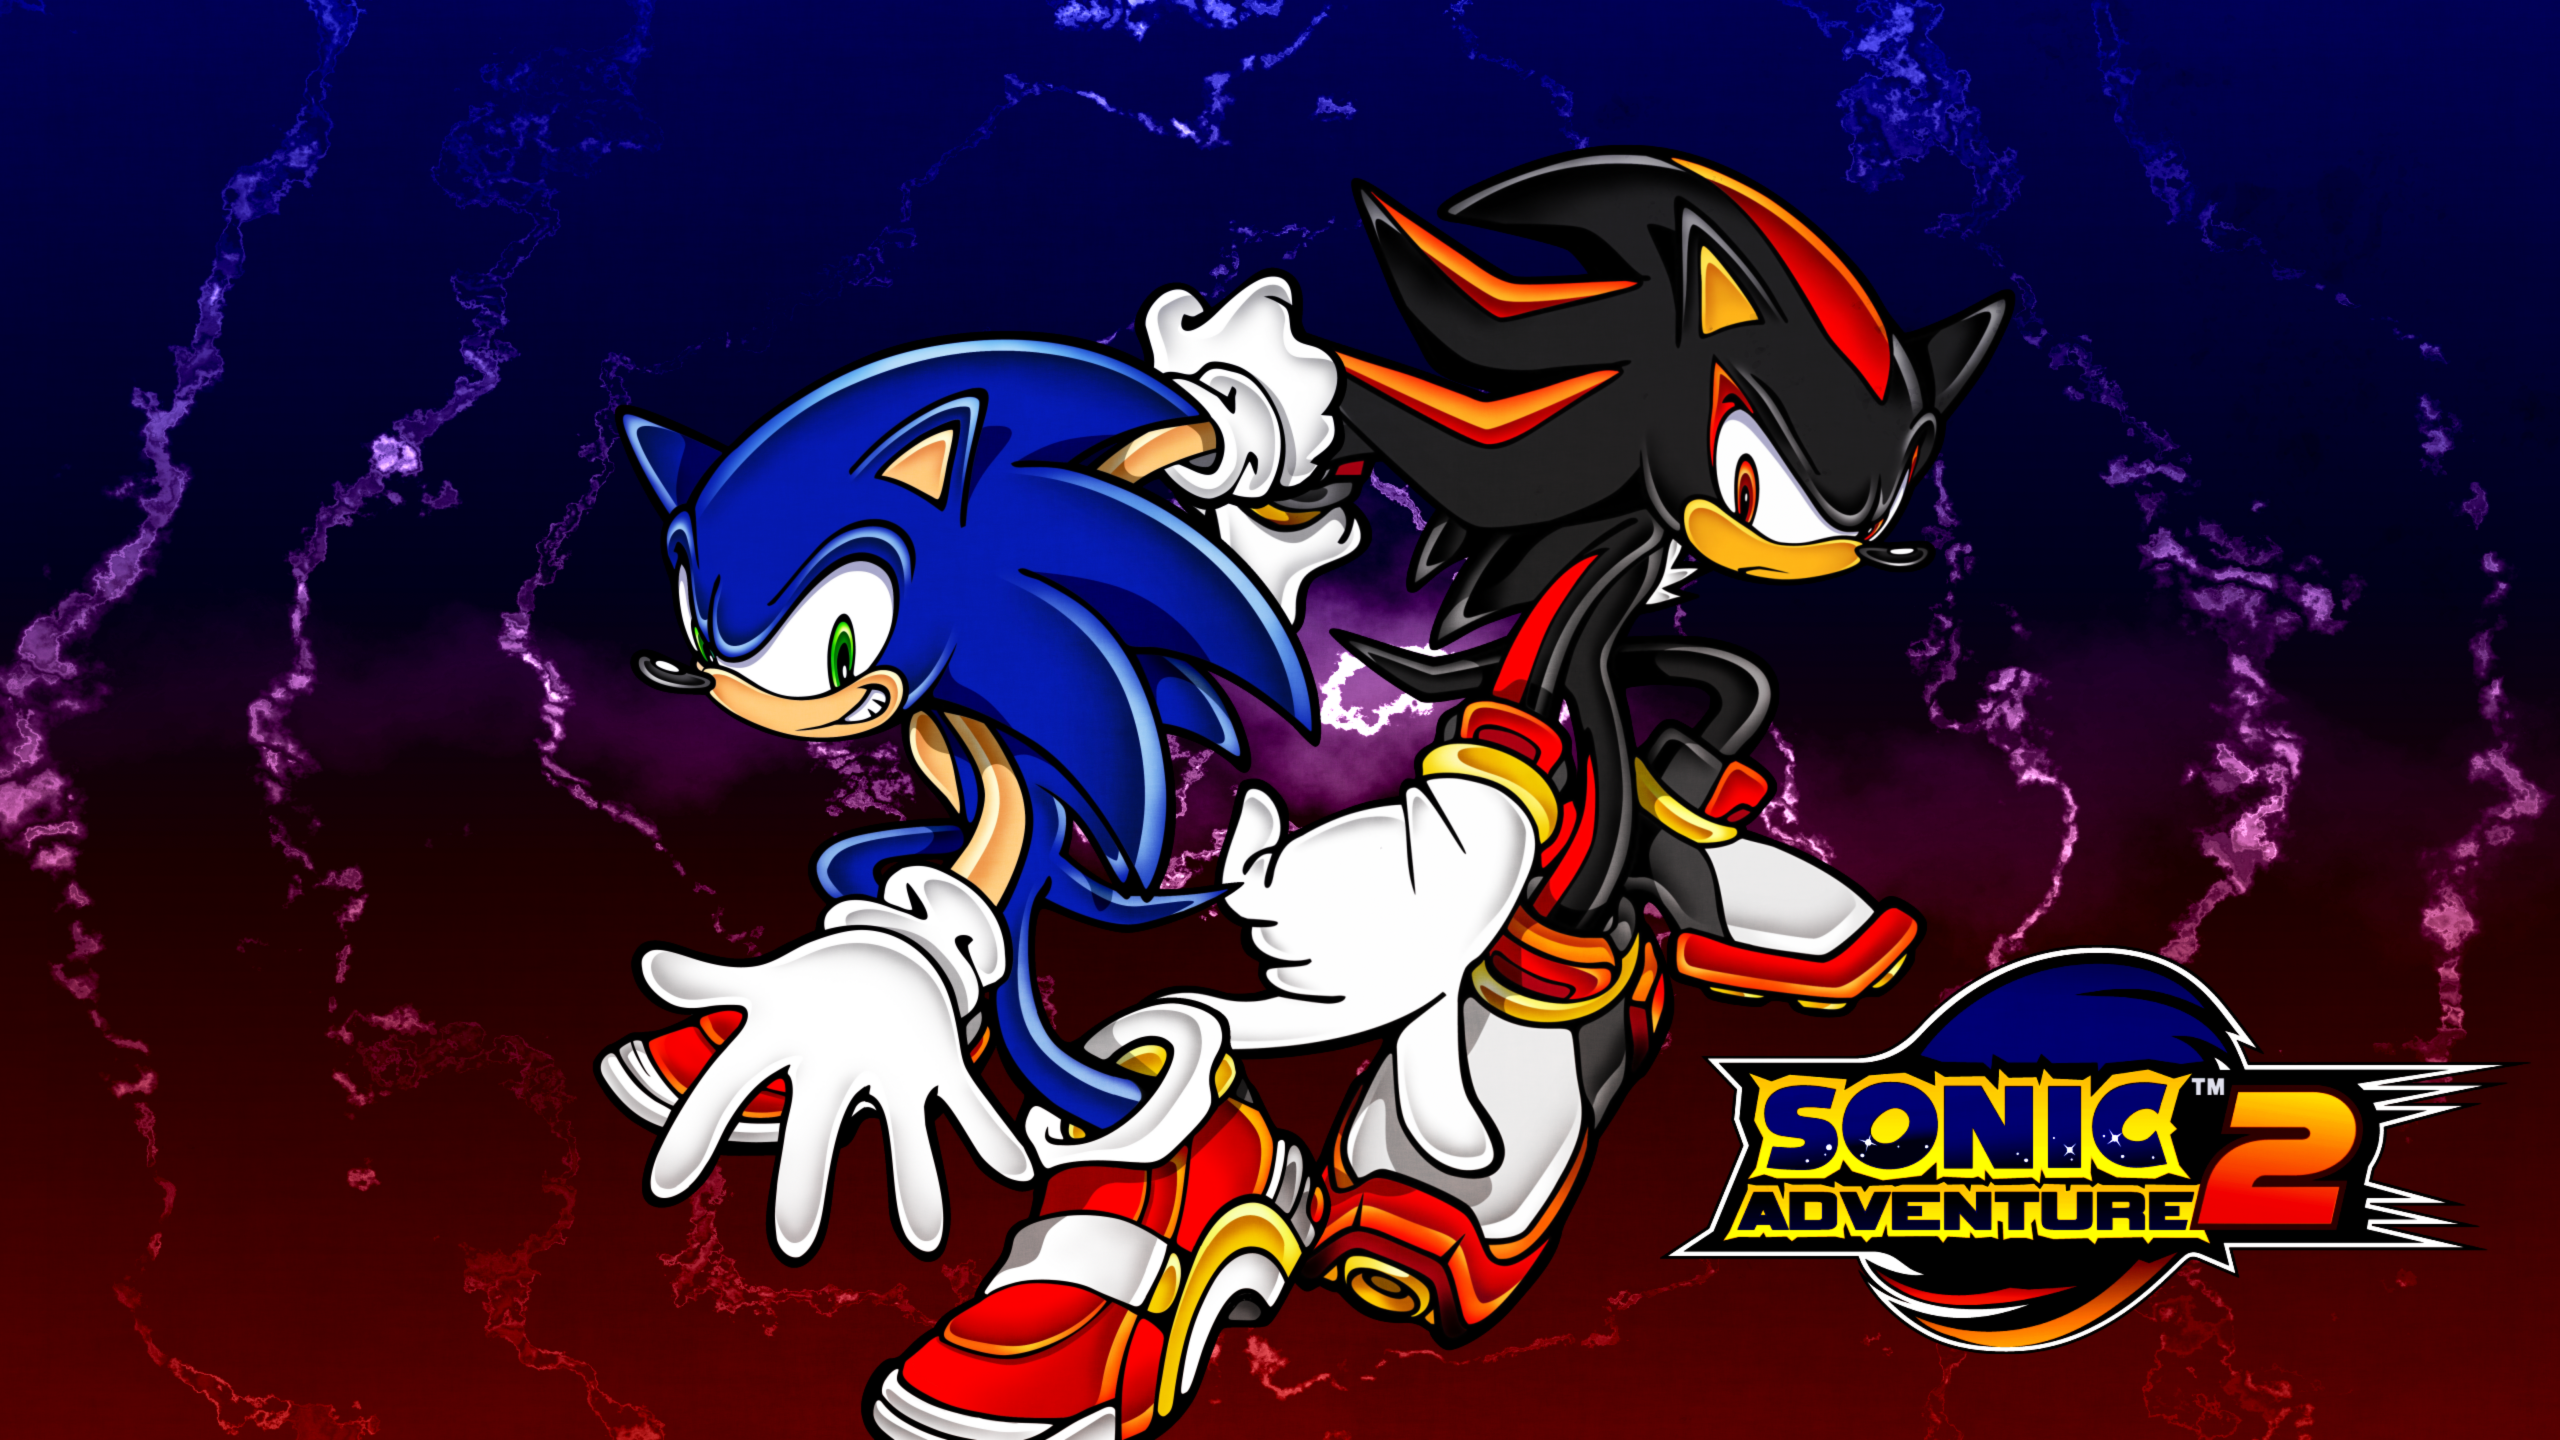 Sonic Adventure 2 1 By Light Rock